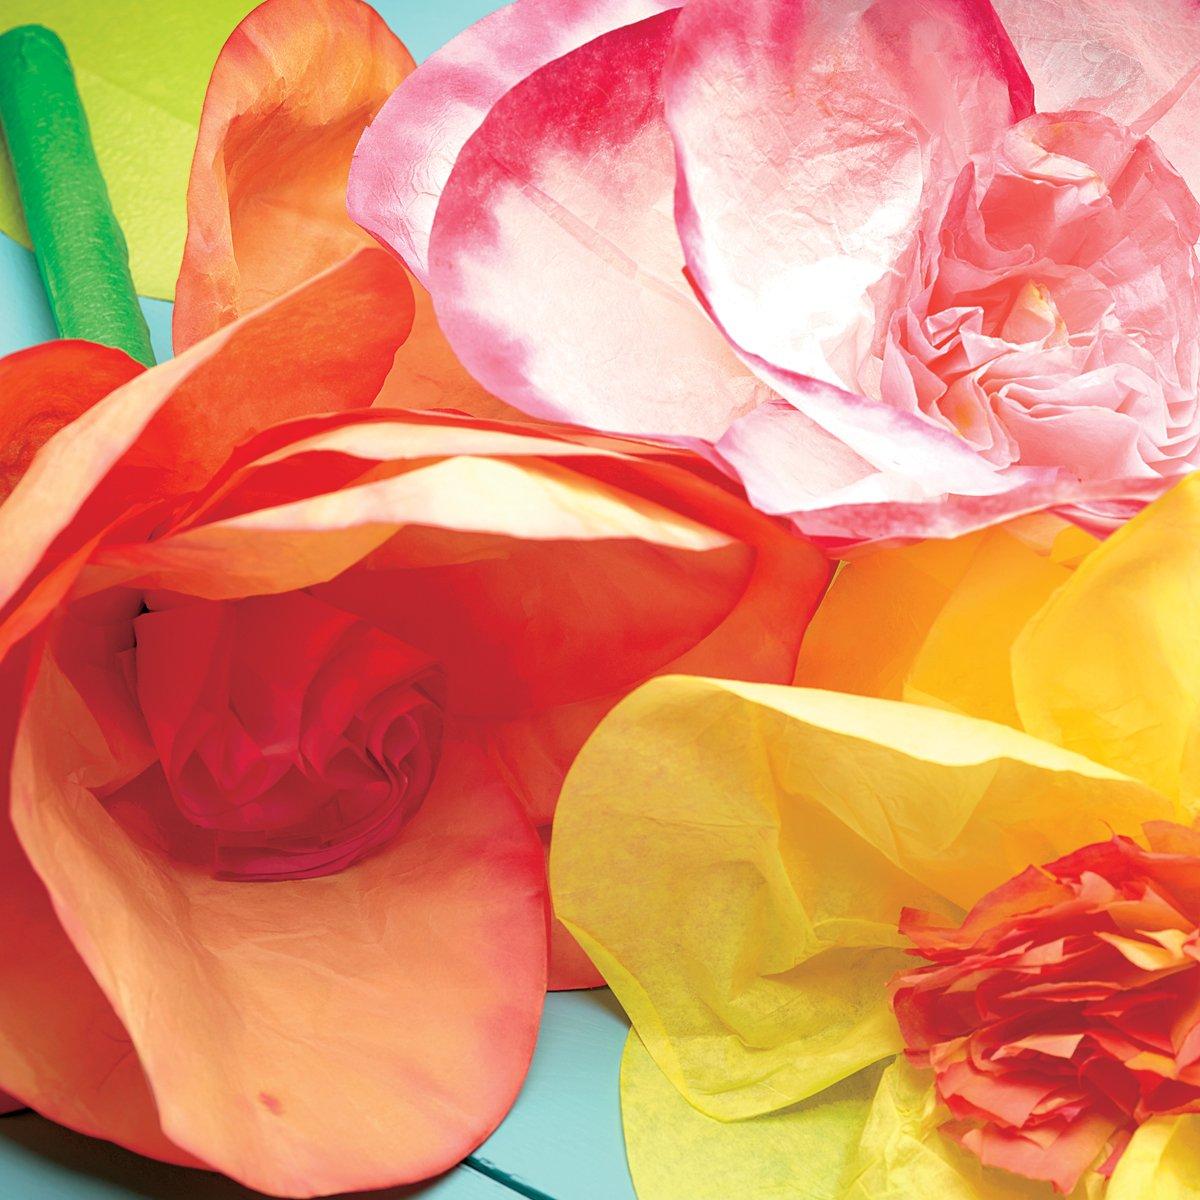 Amazon.com: CRAFTIVITY Posh Petals Craft Kit - Dye and Assemble 3 ...